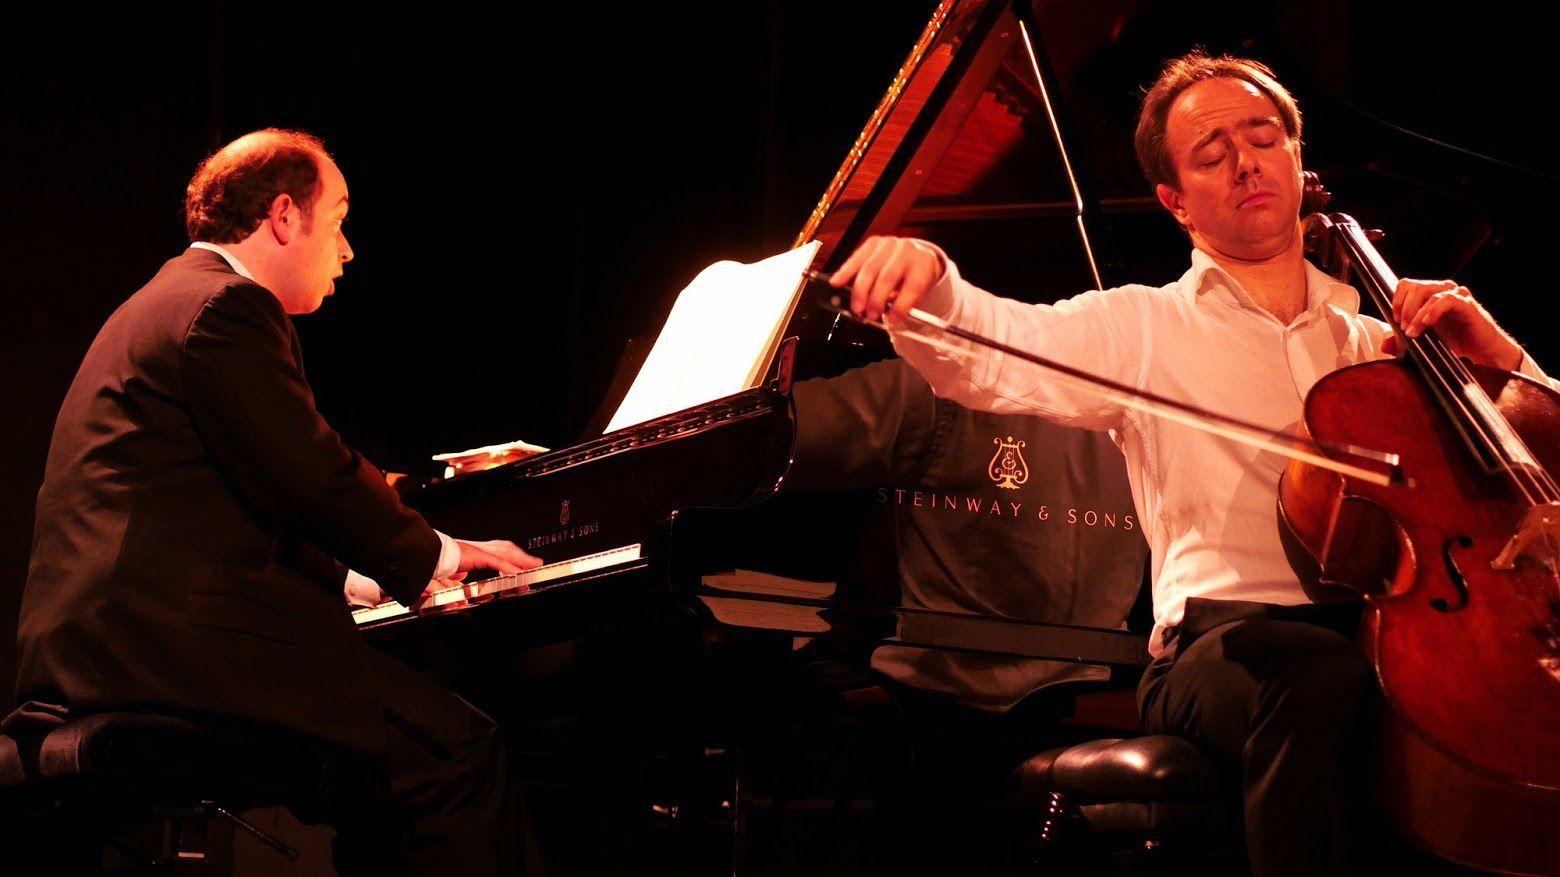 Concertino Brahms et Schubert avec Dumont et Demarquette